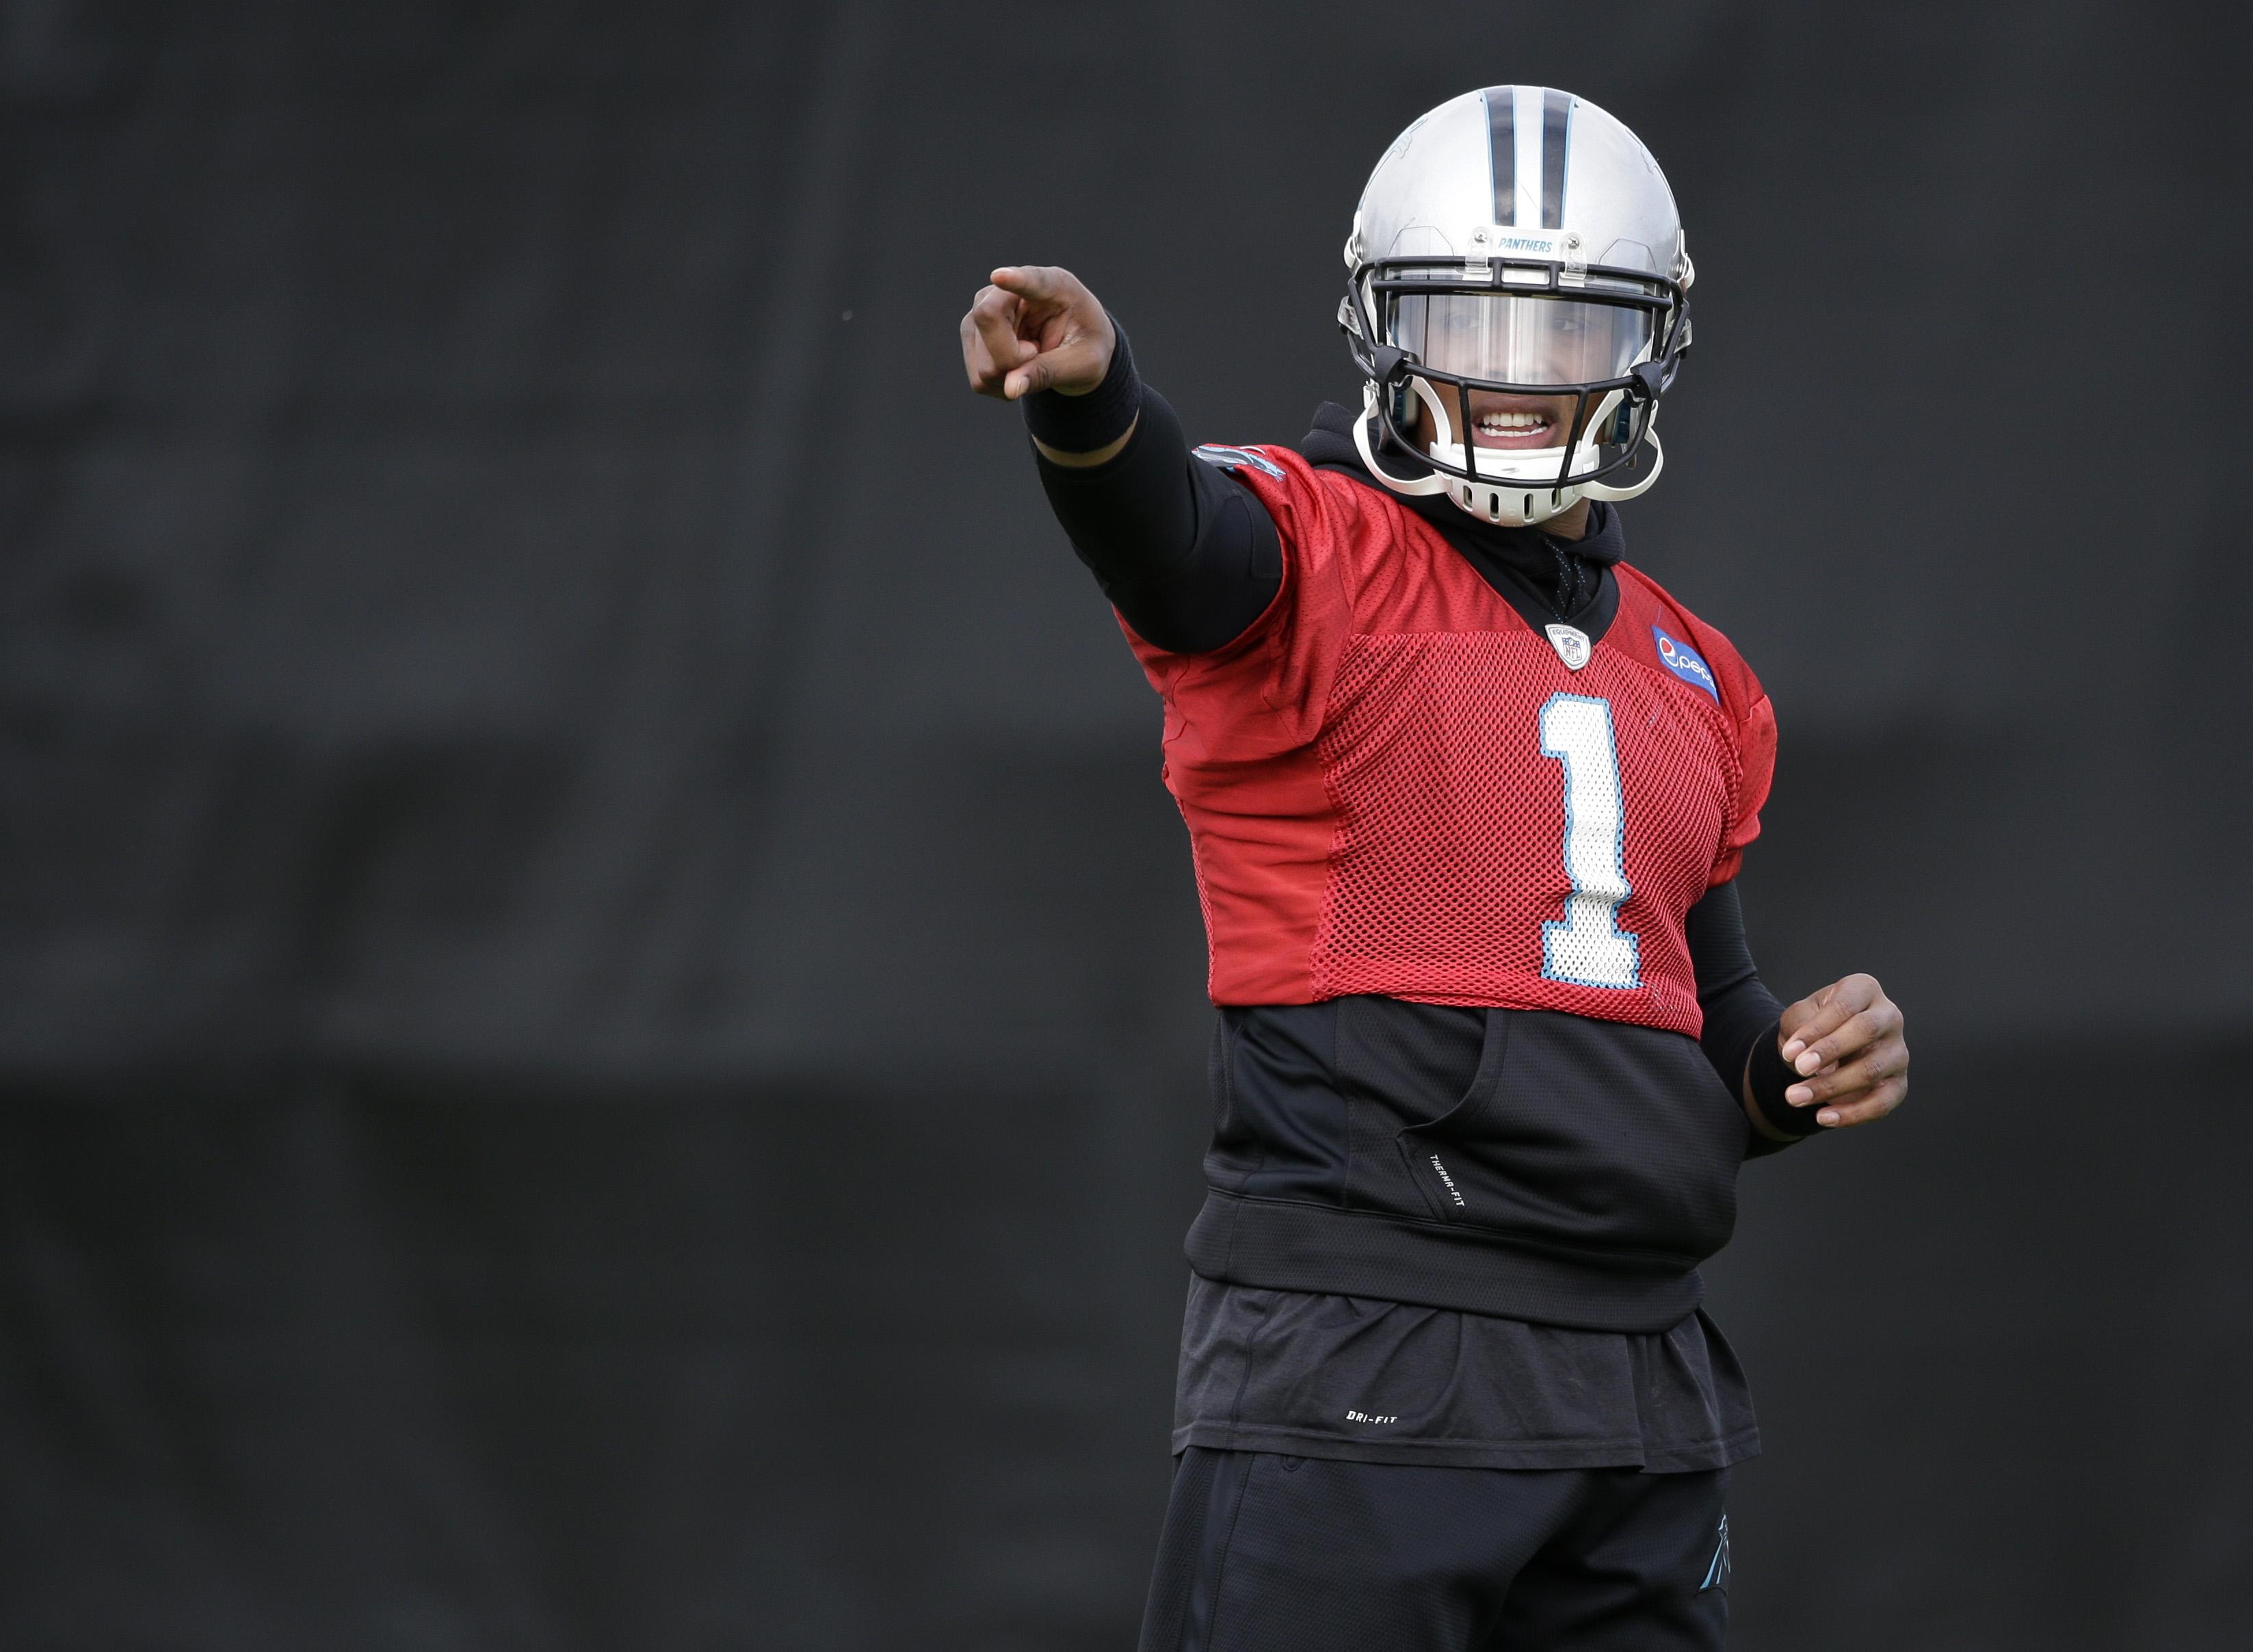 Carolina Panthers quarterback Cam Newton (1) directs receivers during practice Wednesday, Feb. 3, 2016 in San Jose, Calif. Carolina plays the Denver Broncos in the NFL Super Bowl 50 football game Sunday, Feb. 7, 2015, in Santa Clara, Calif. (AP Photo/Marc